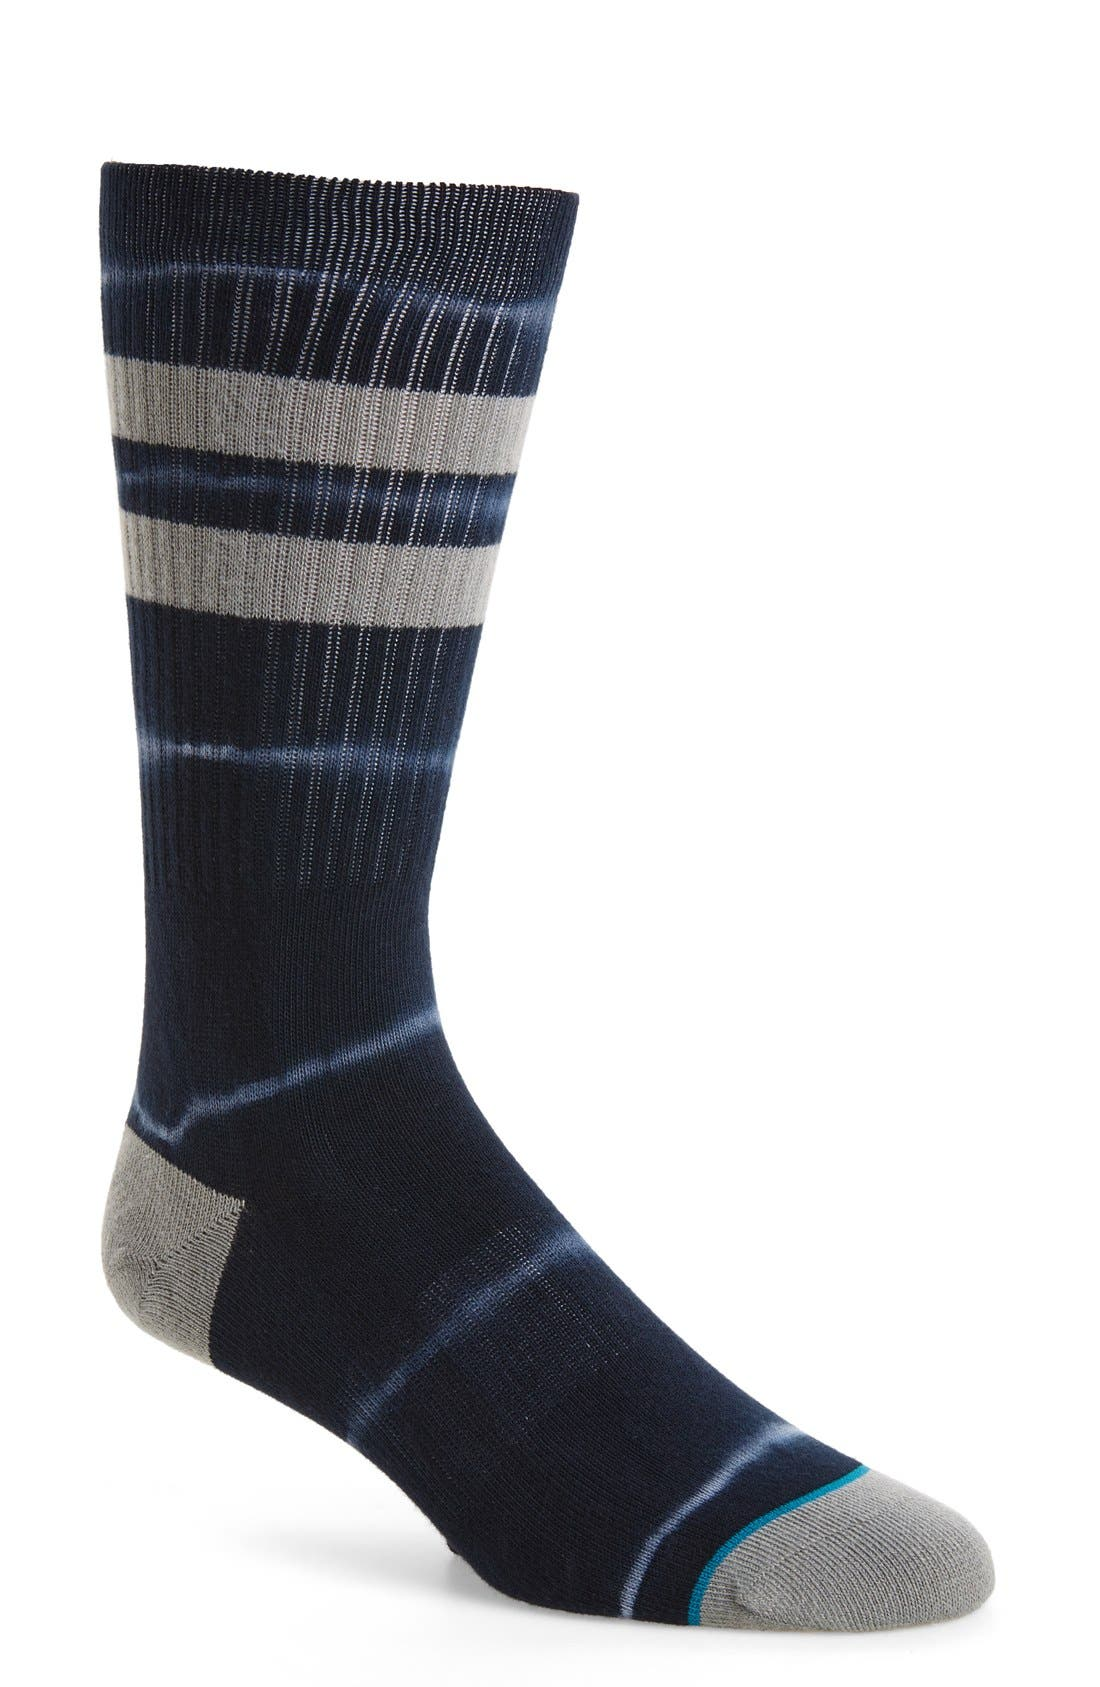 6AM Classic Crew Socks,                         Main,                         color, 001